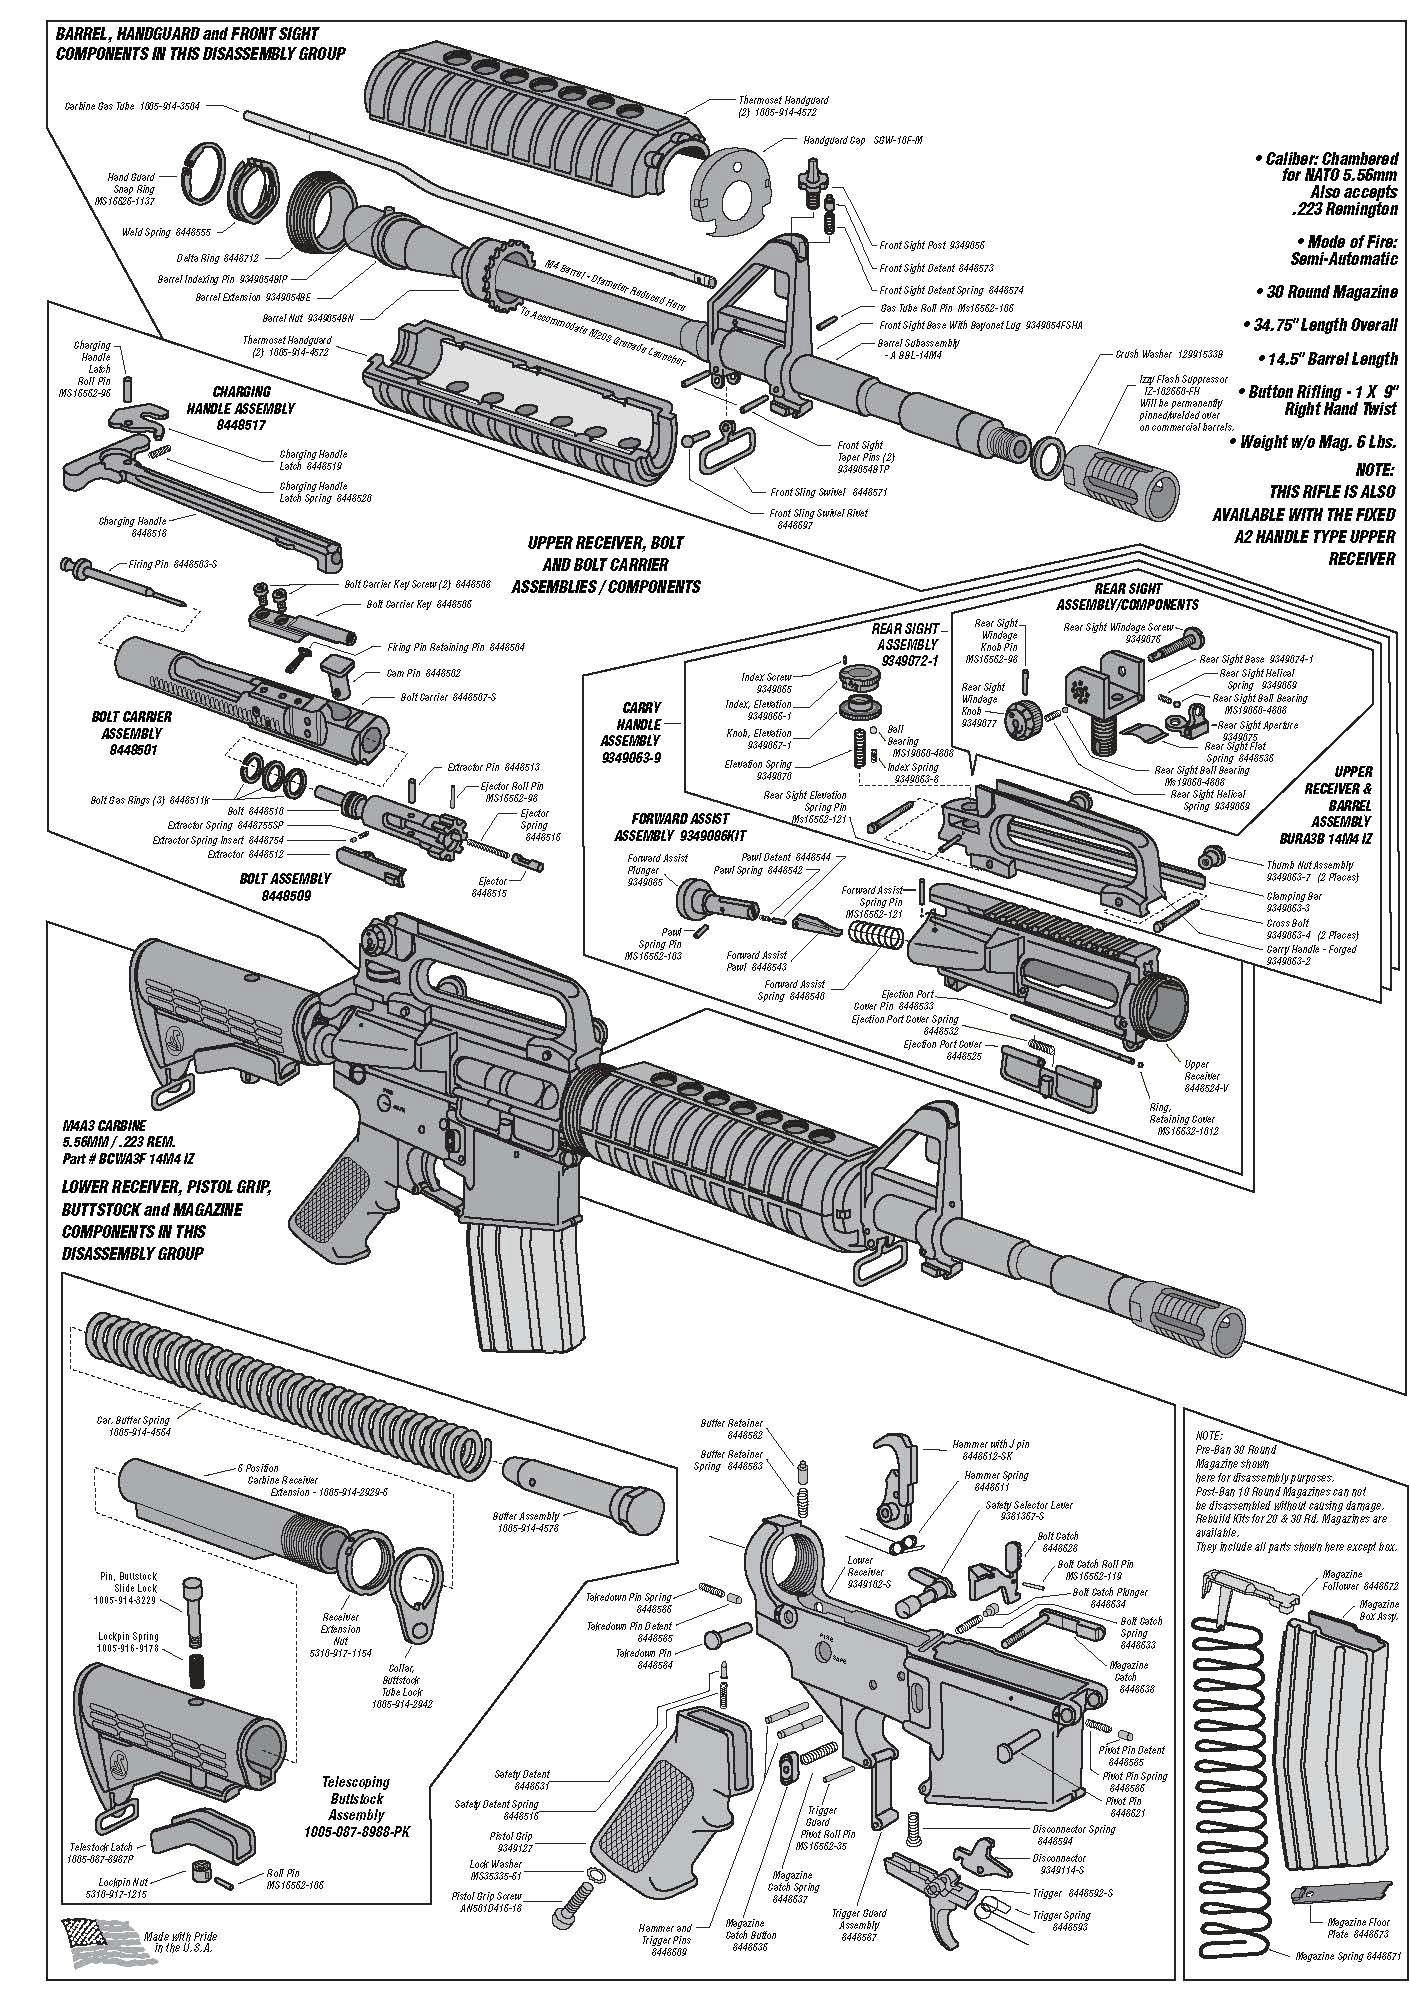 ar schematic handgun firearms tactical rifles revolvers shotguns m16 rifle